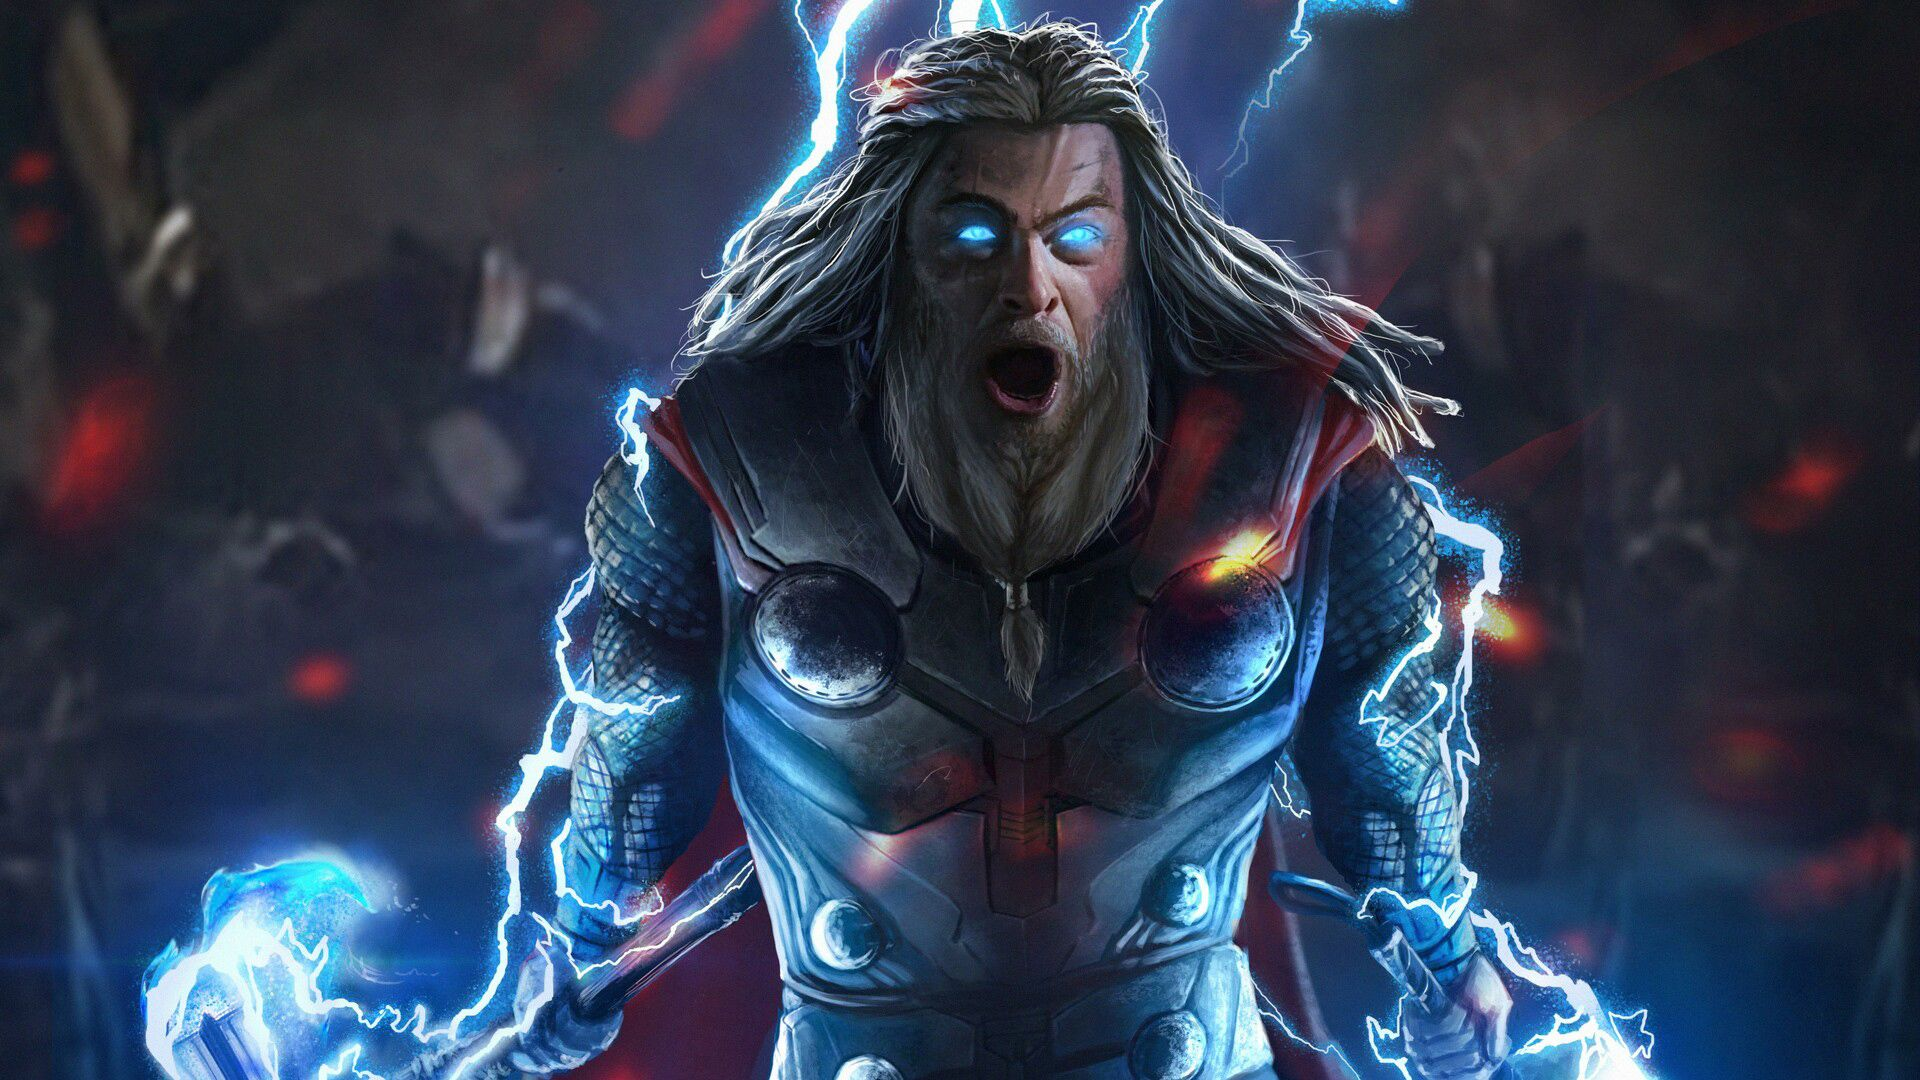 Thor Stormbreaker Wallpapers Top Free Thor Stormbreaker